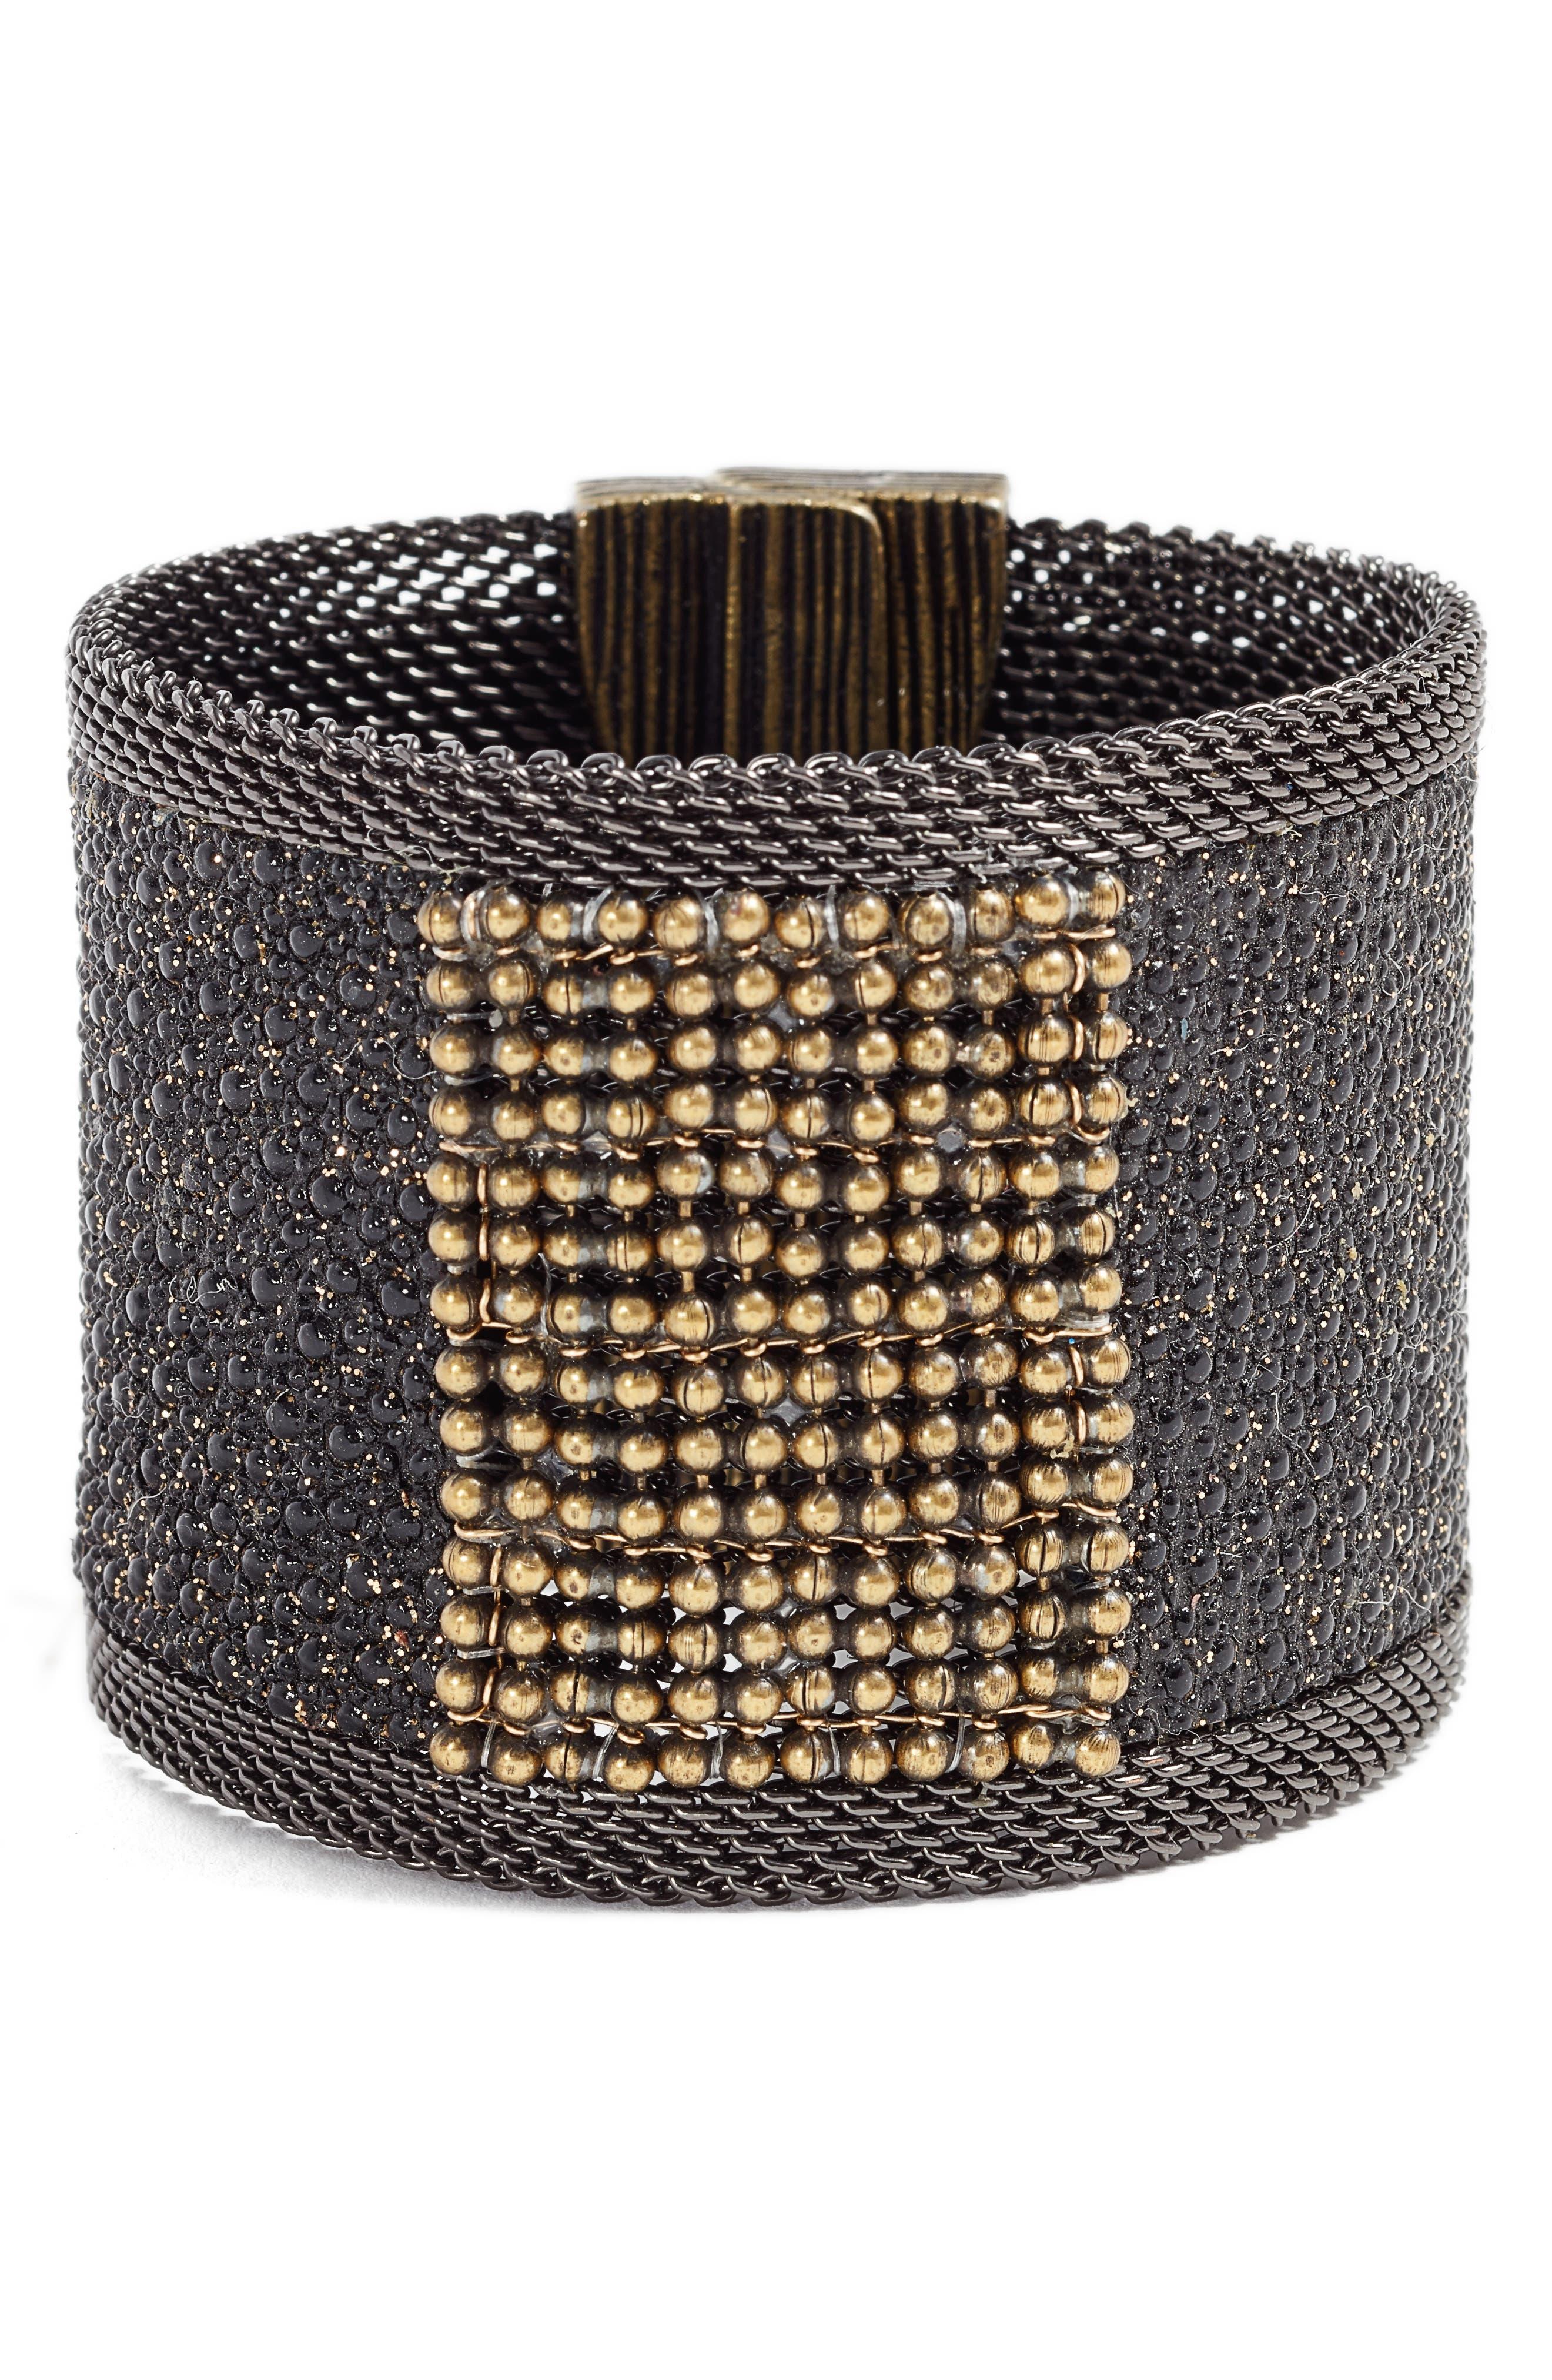 Wide Shimmer Stingray Bracelet,                             Main thumbnail 1, color,                             BLACK/ GOLD/ GUNMETAL